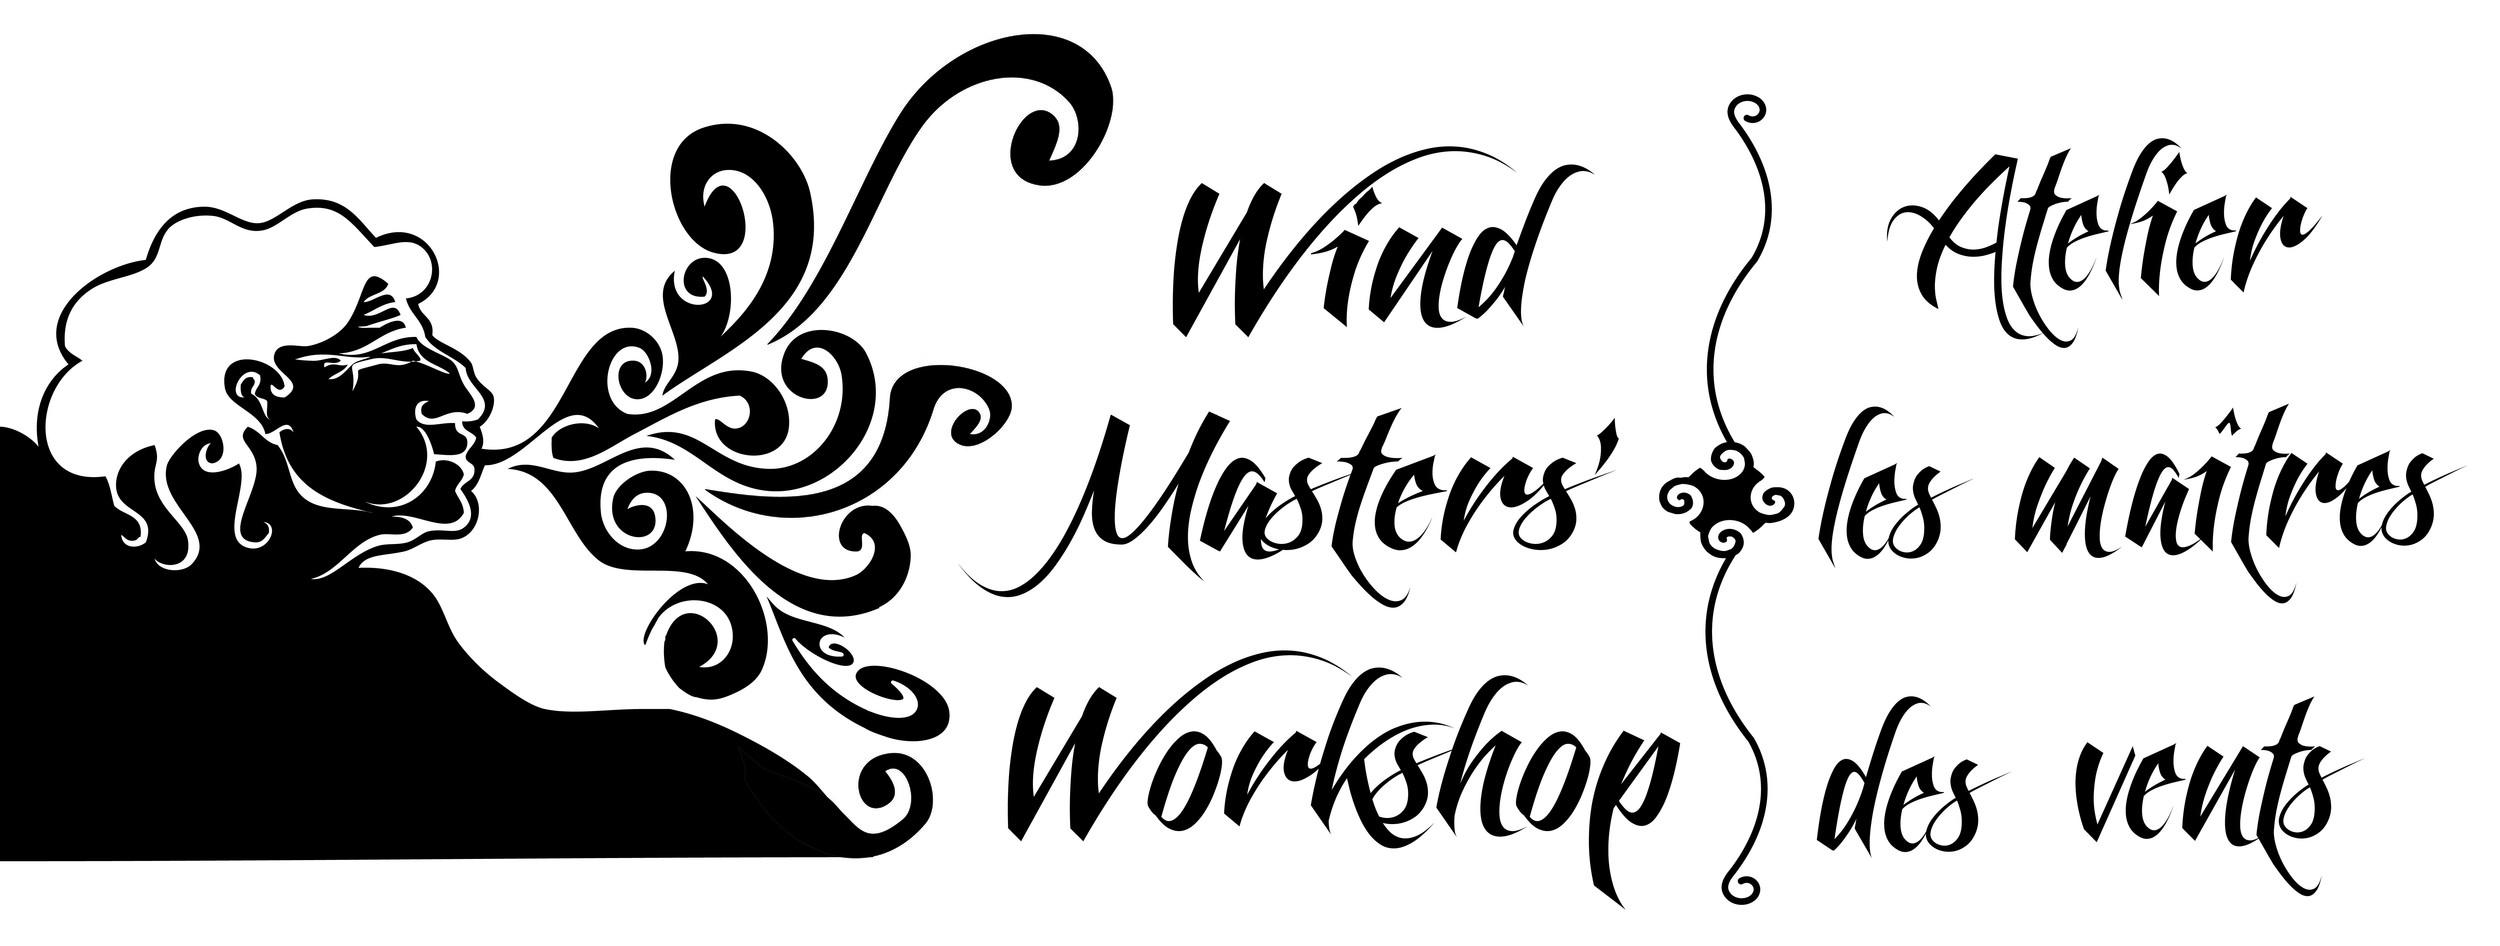 wind masters.jpg